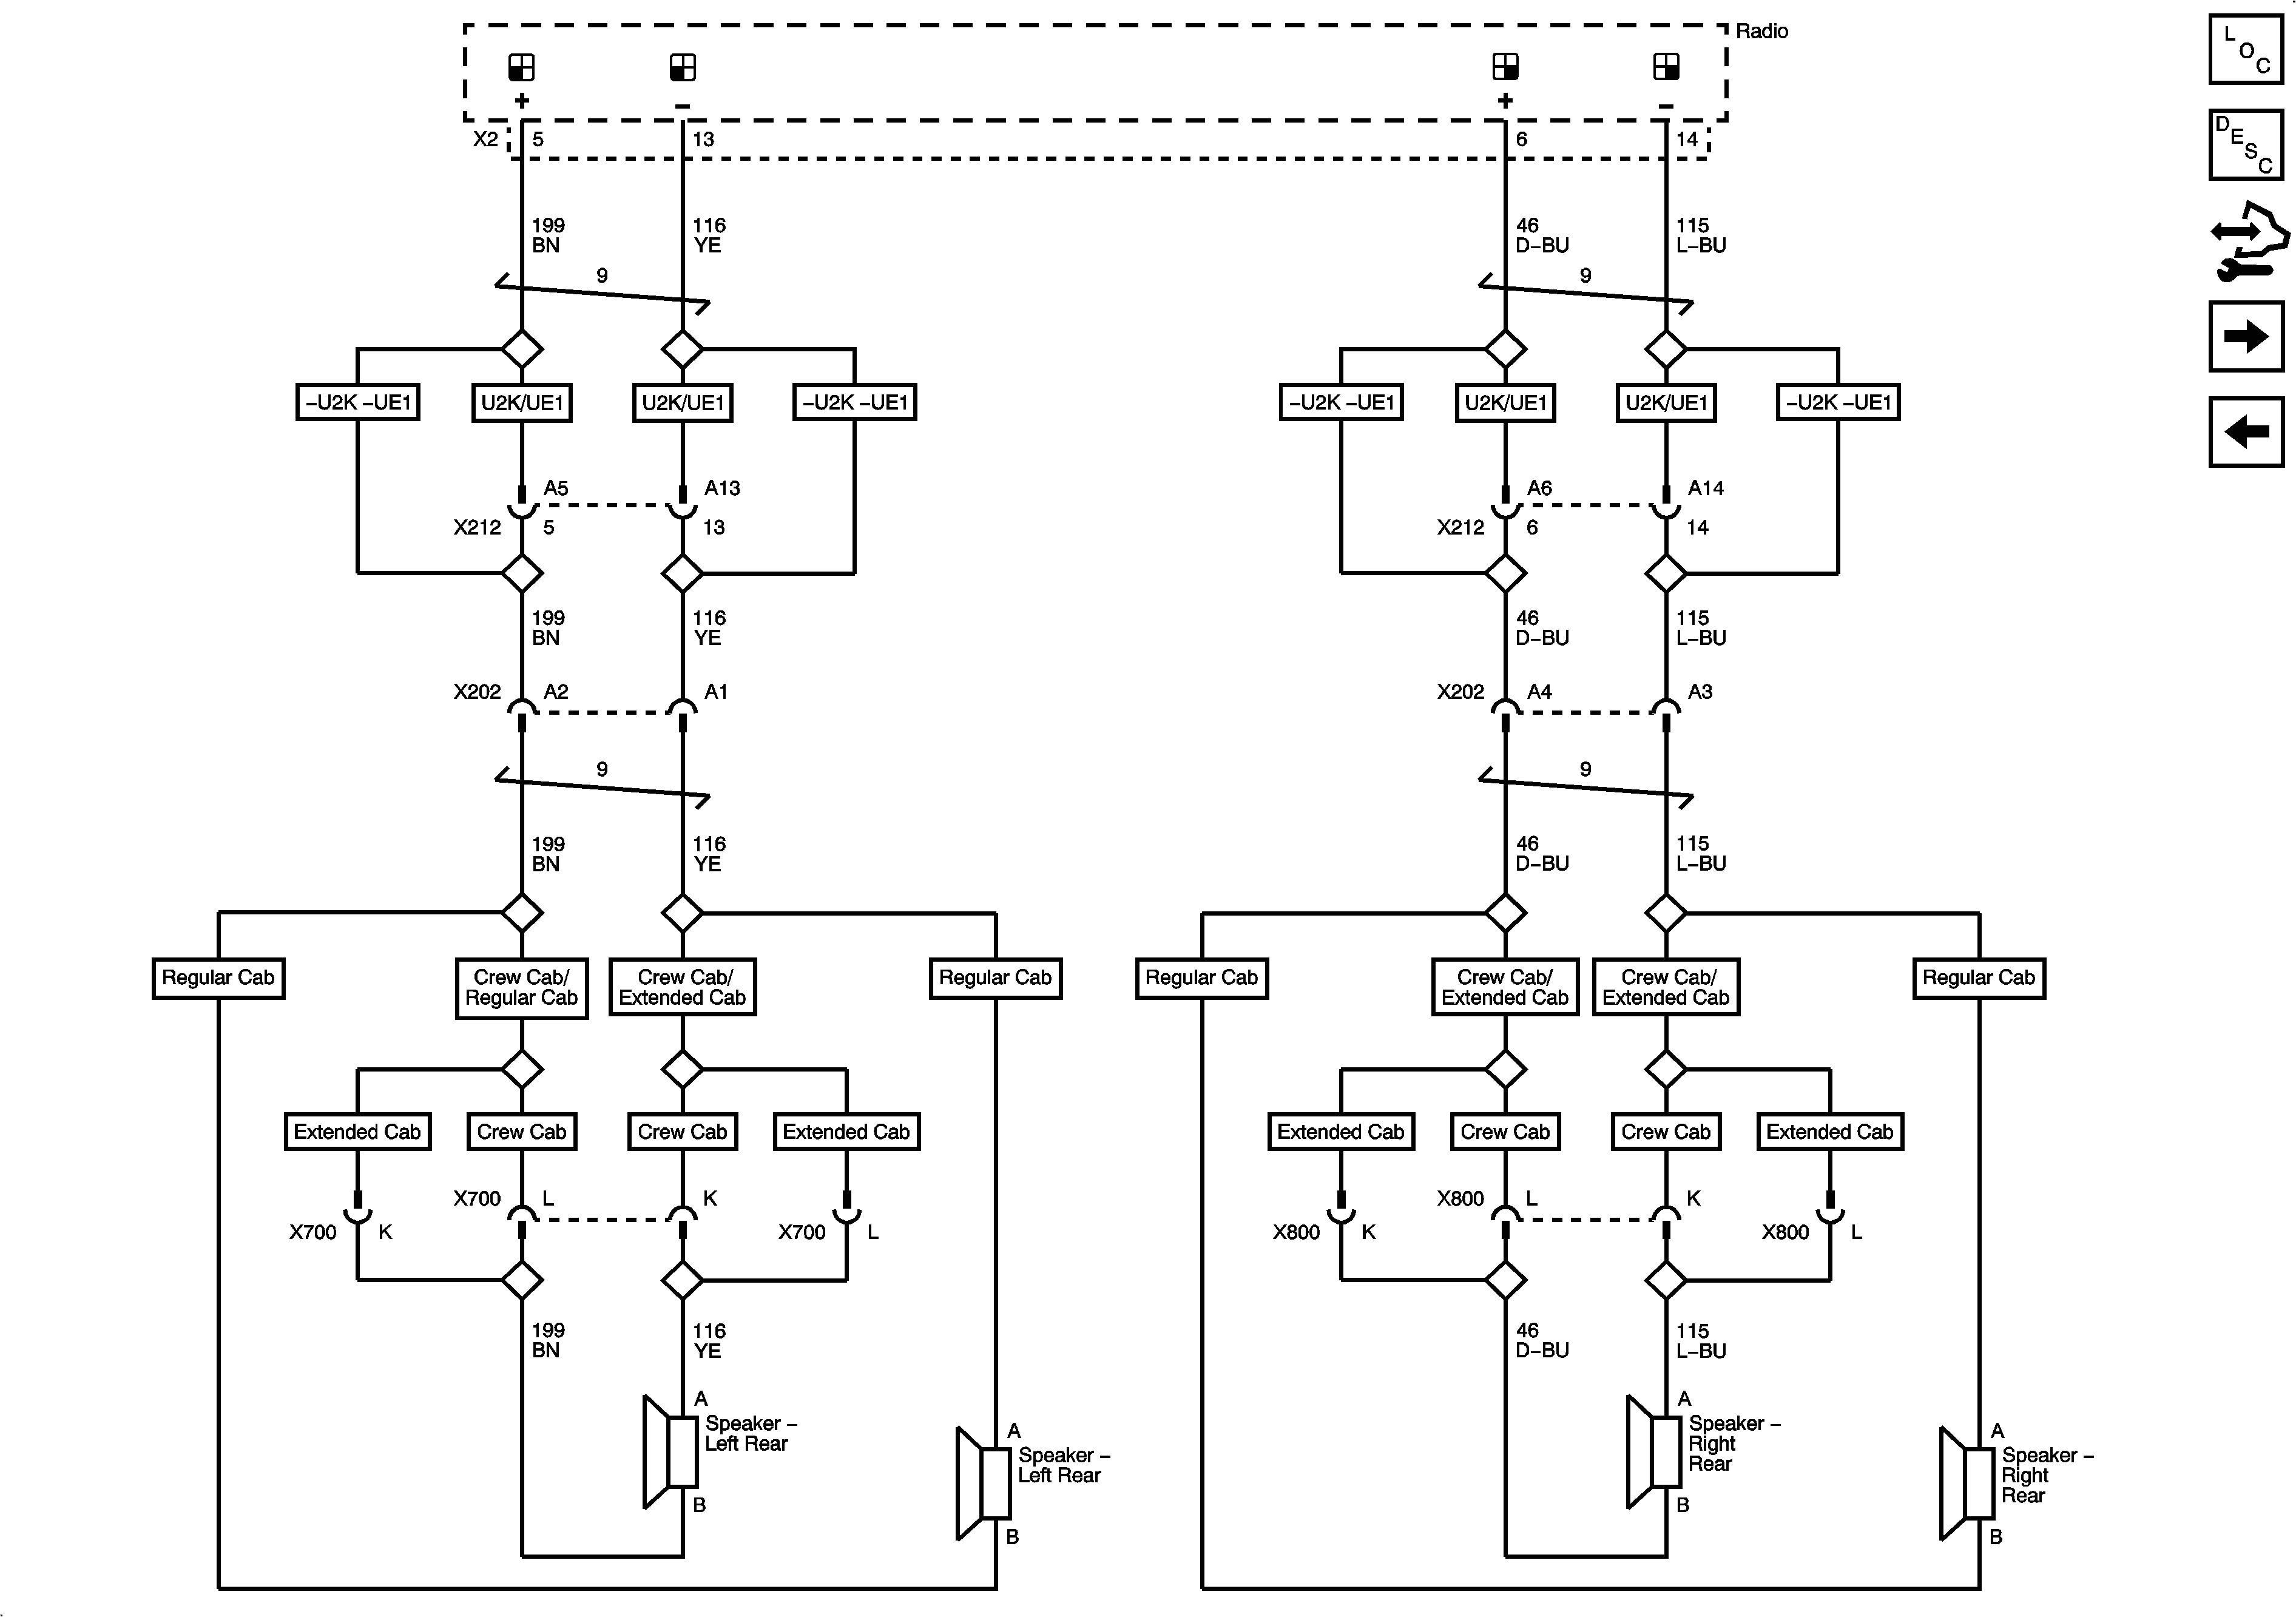 2006 Chevy Silverado Wiring Diagram Wiring Diagram for Besides 2006 Chevy Silverado Trailer Fuses On